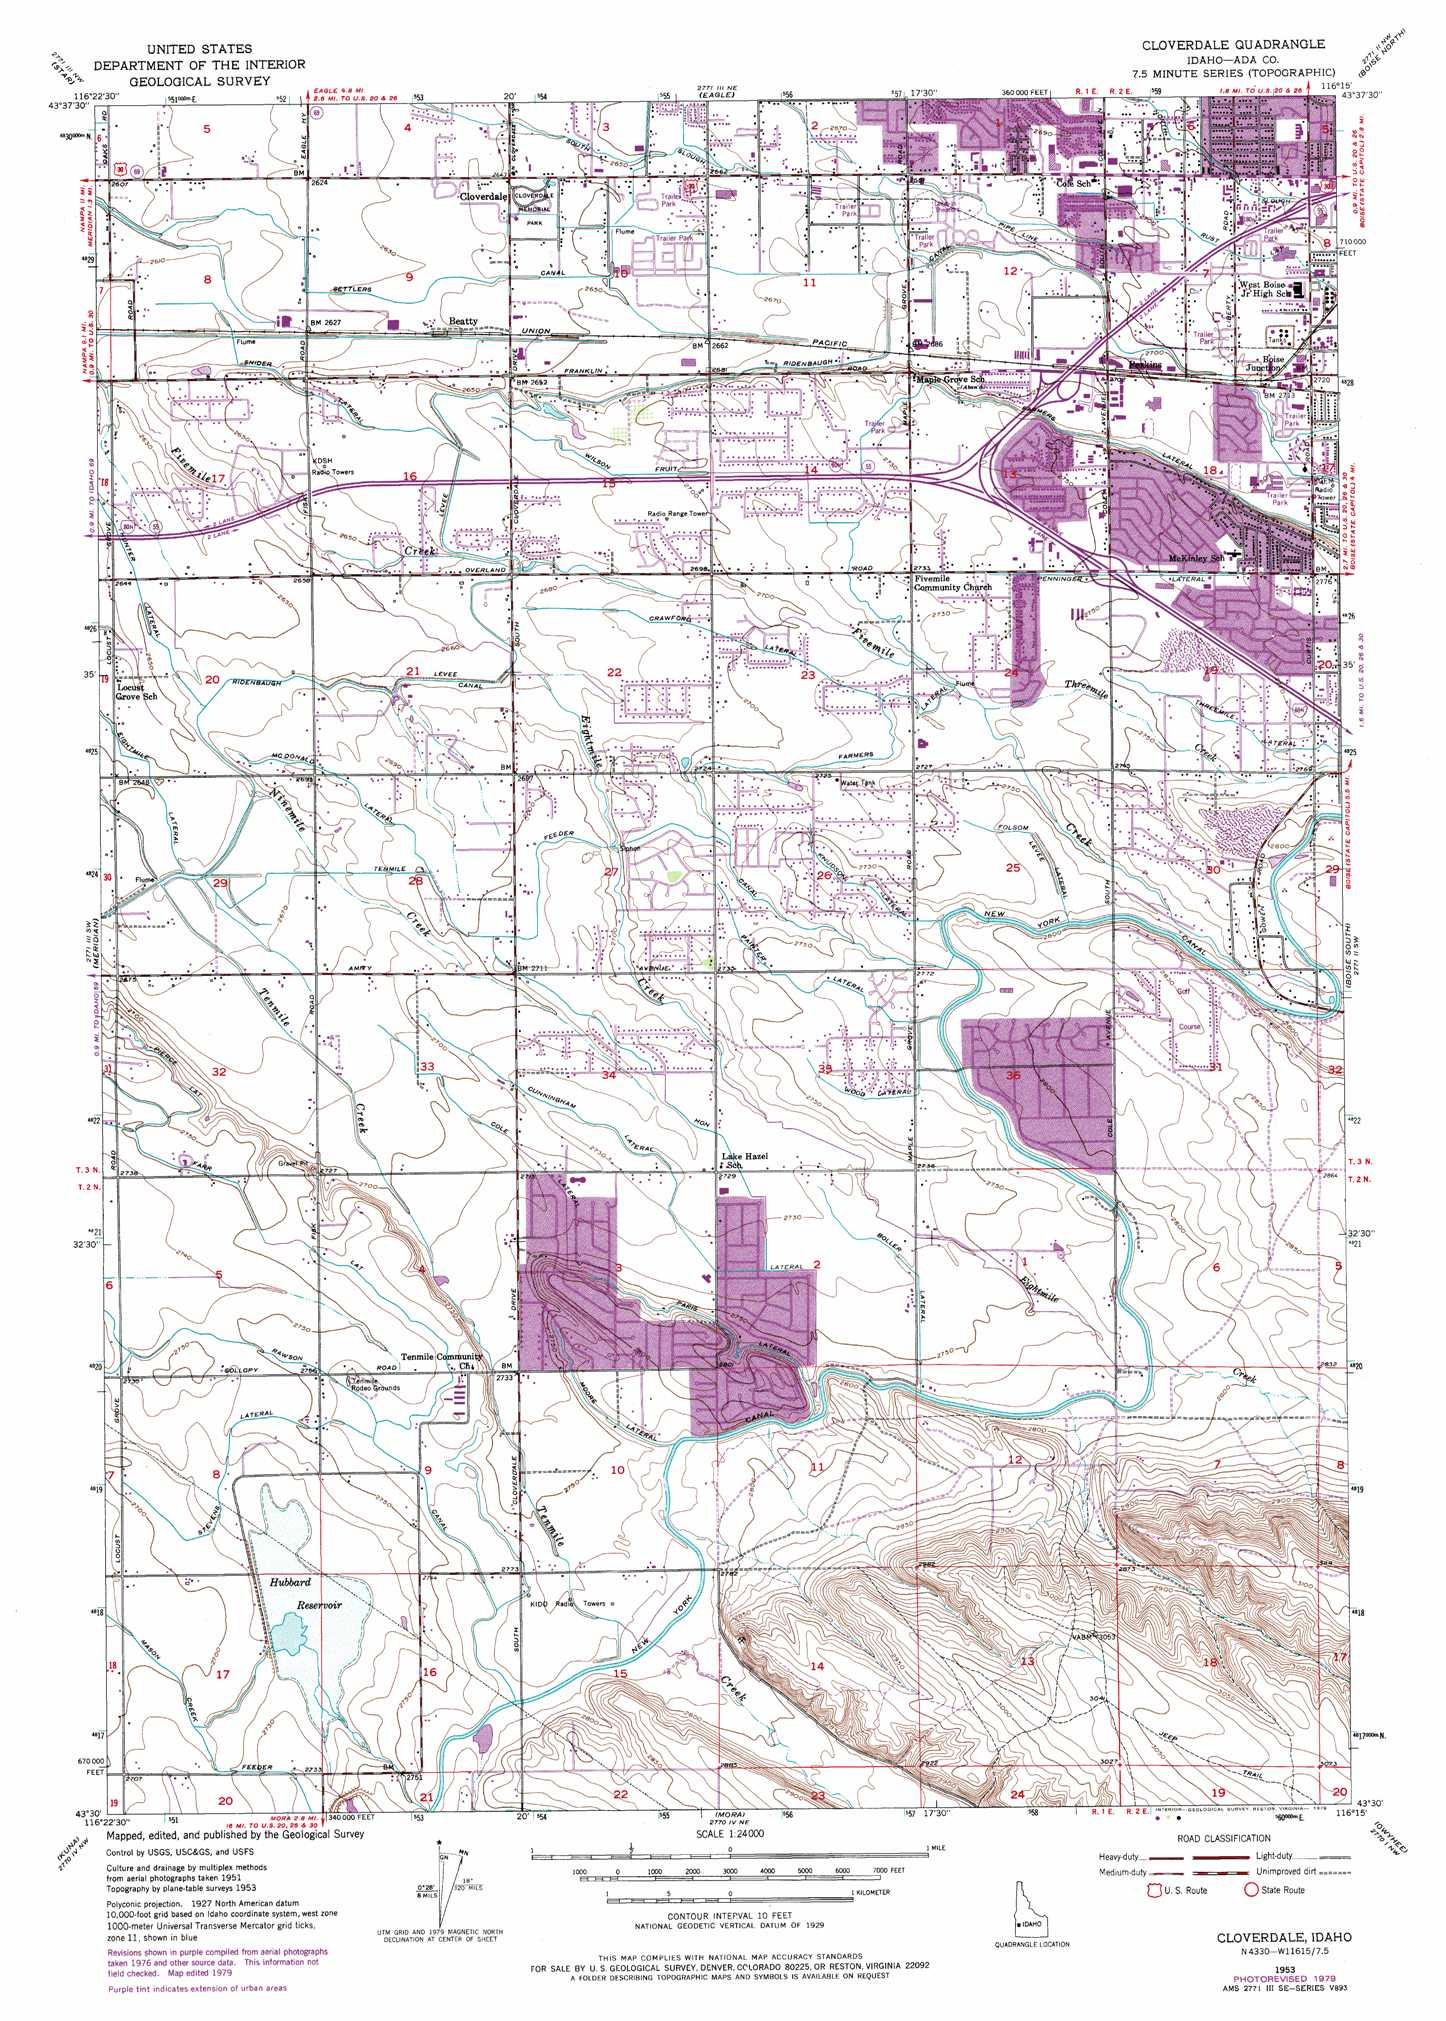 Cloverdale topographic map ID USGS Topo Quad 43116e3